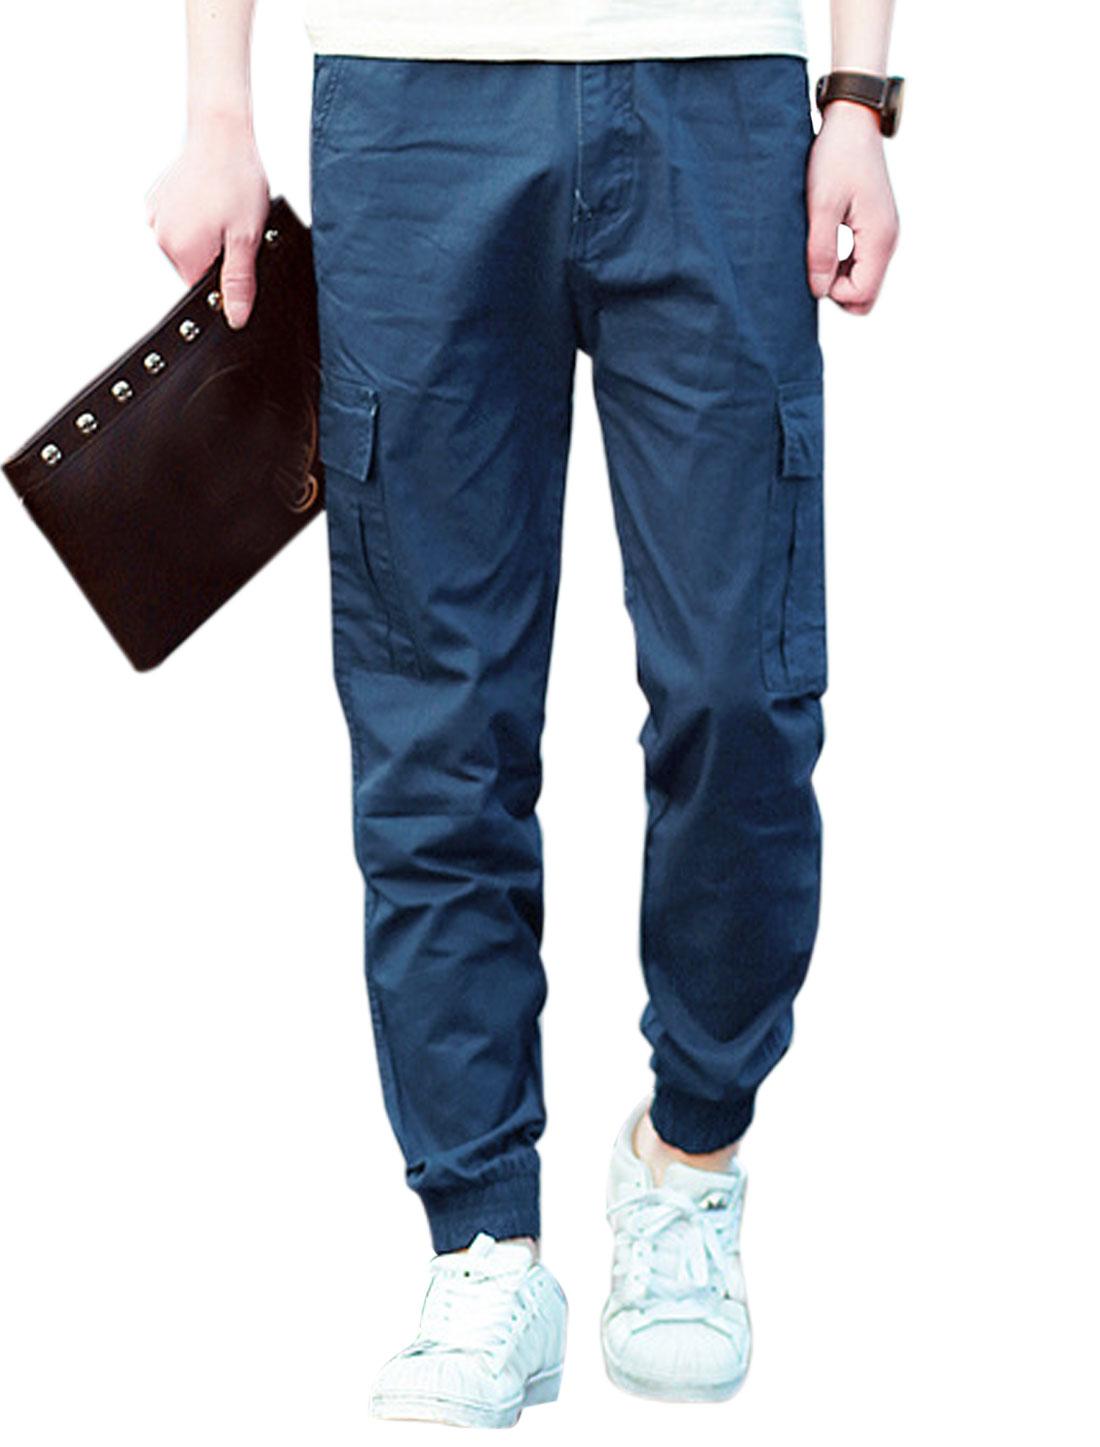 Men Elastic Thigh Cuffs Cargo Pockets Side Leisure Pants Dark Blue W32